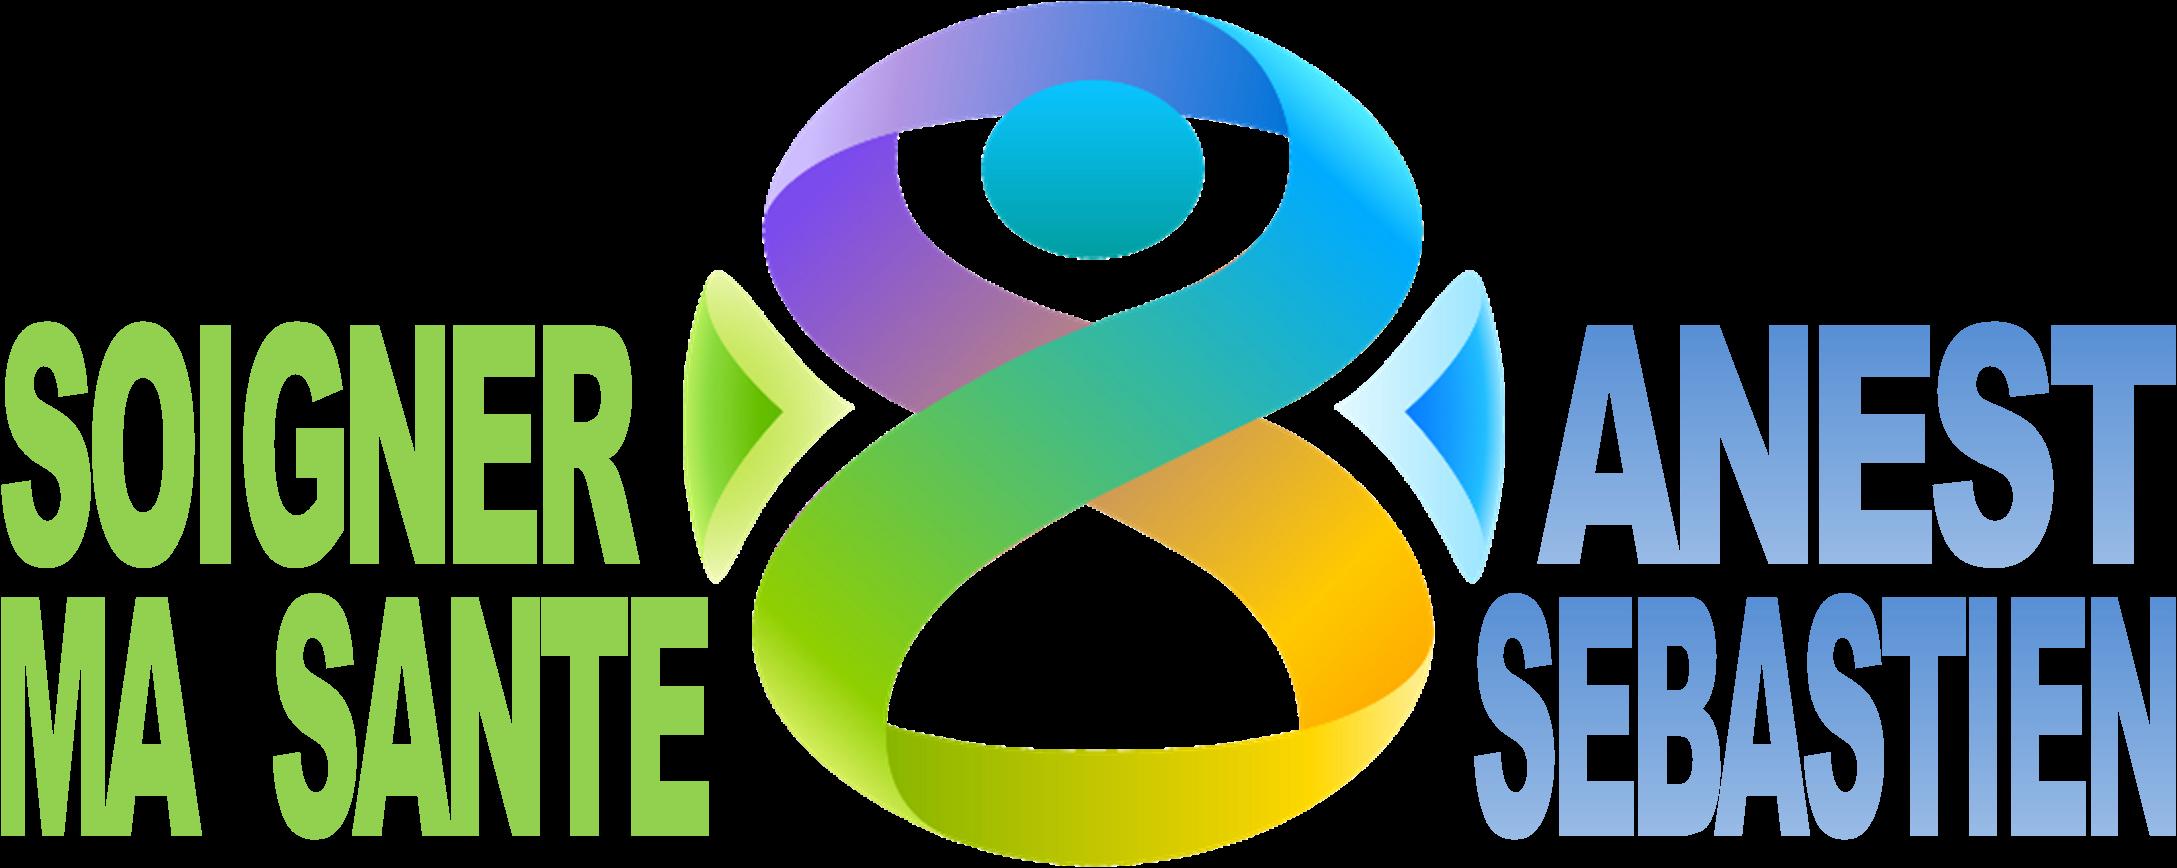 SOIGNER MA SANTE ANEST logo